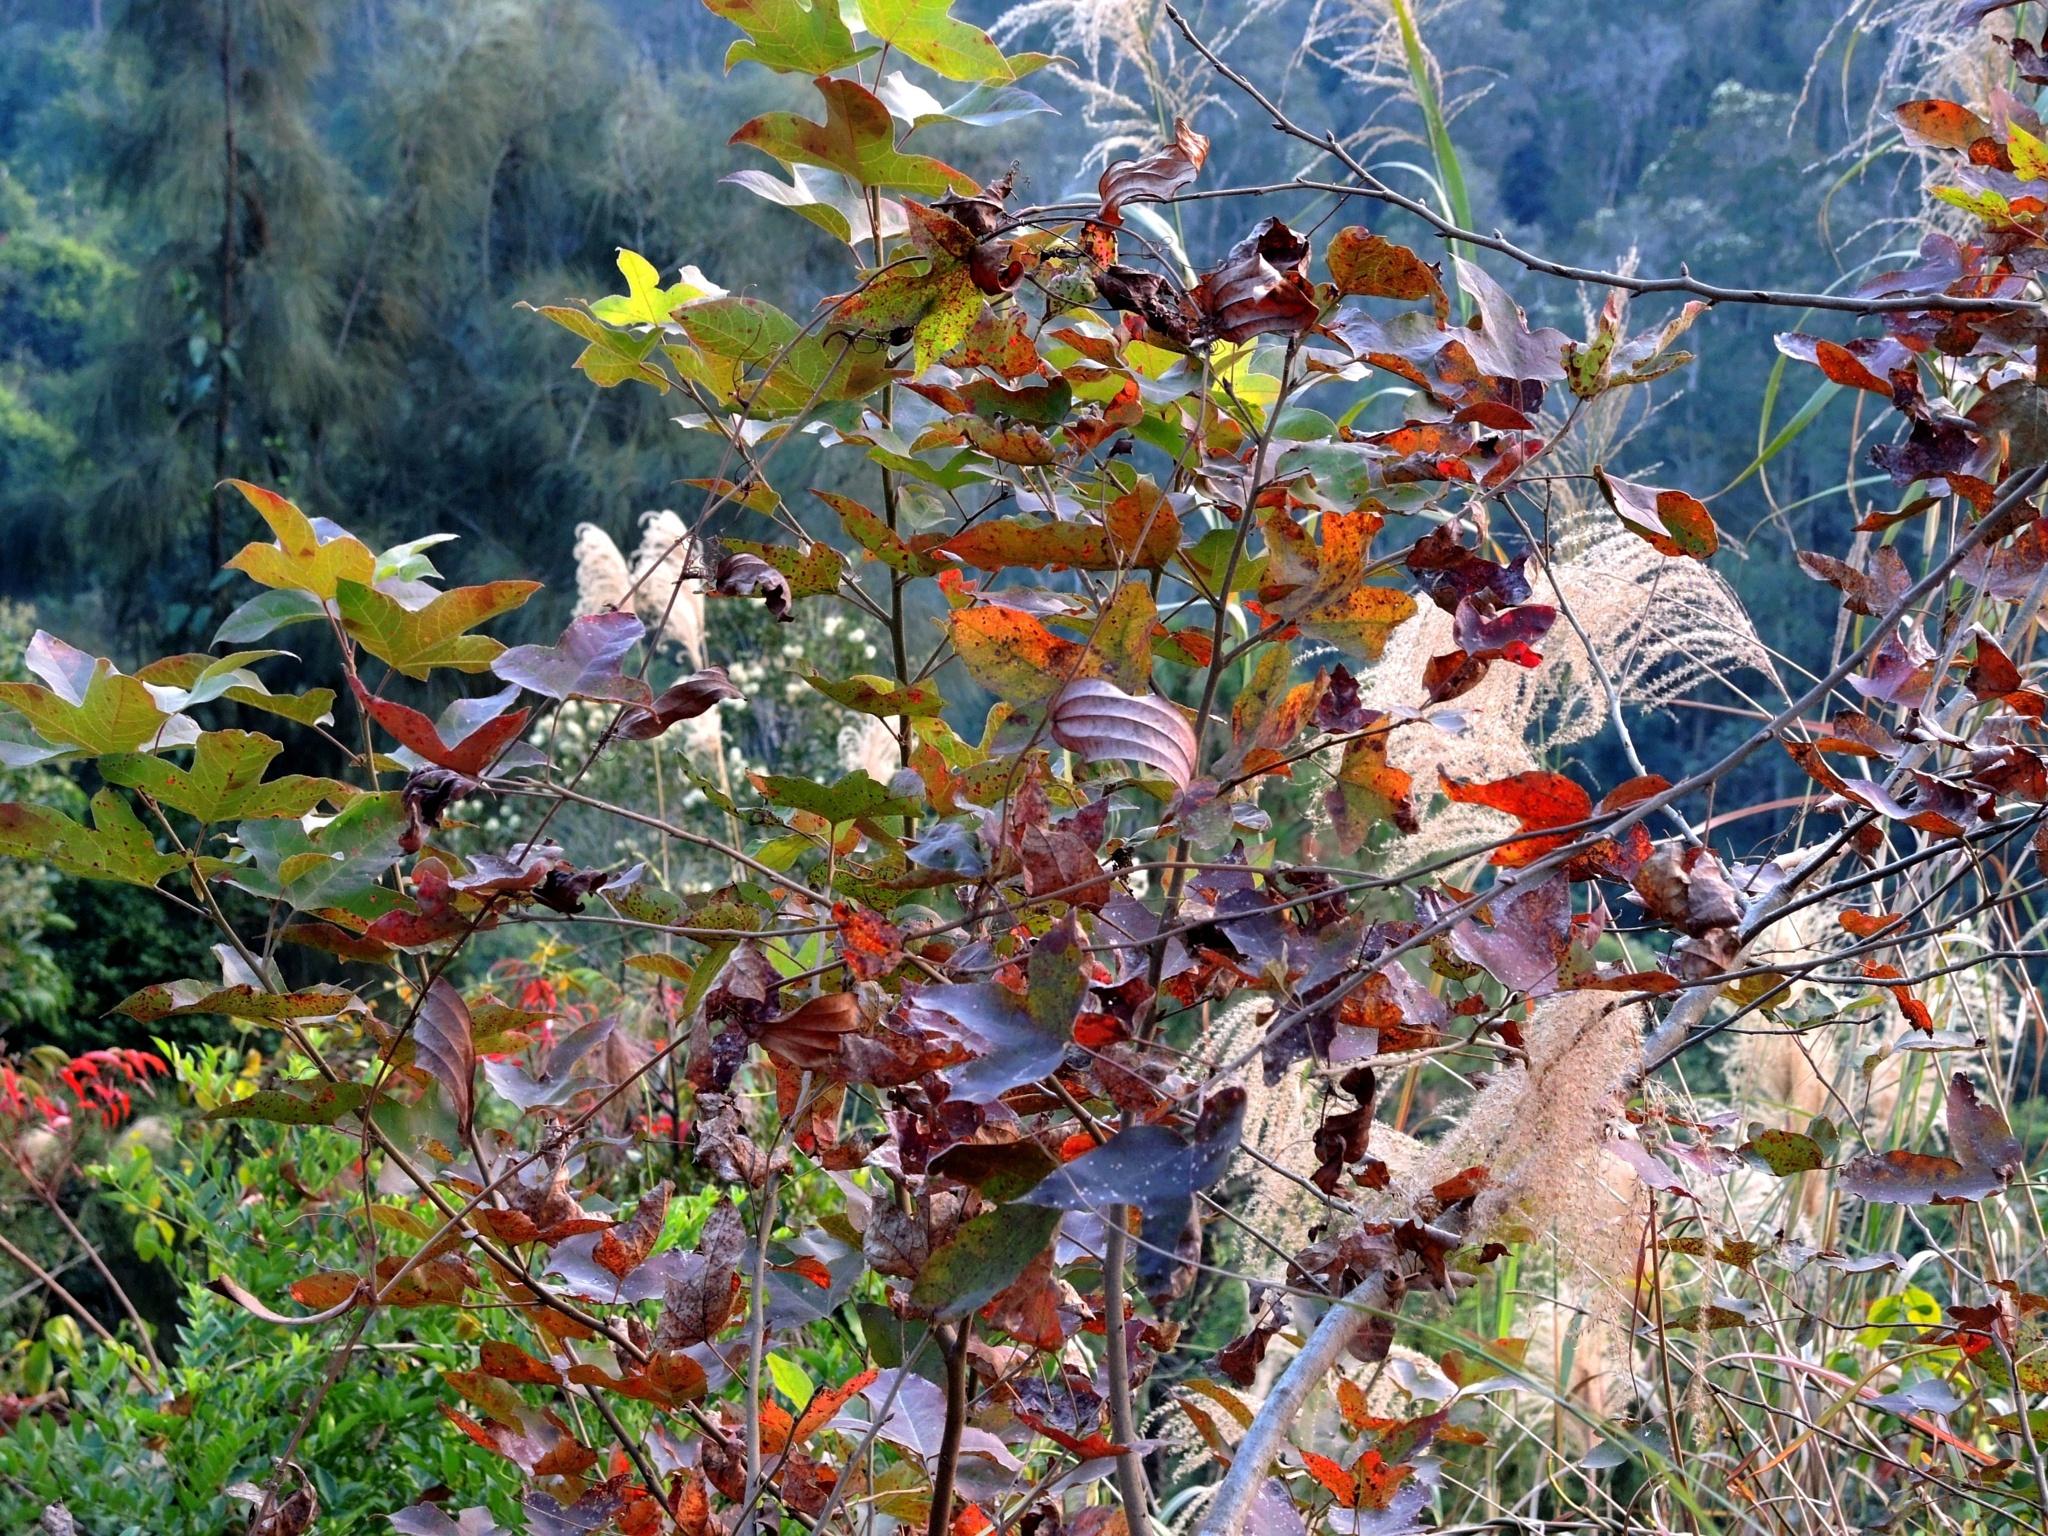 Leaves at Tai Tong Park by pop88123